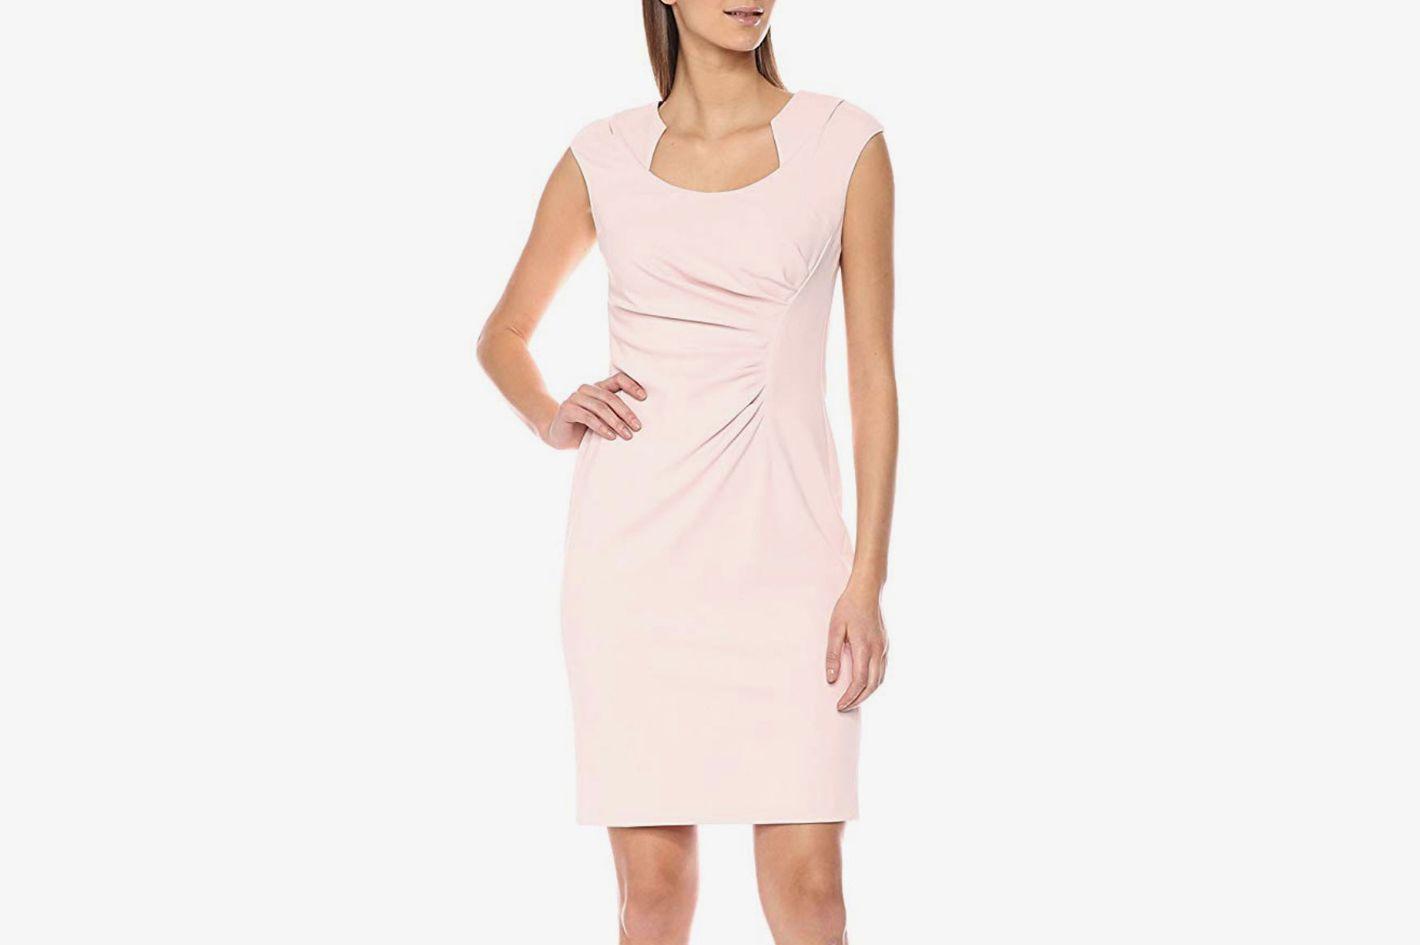 Calvin Klein Cap Sleeved Sheath with Horseshoe Neckline Dress